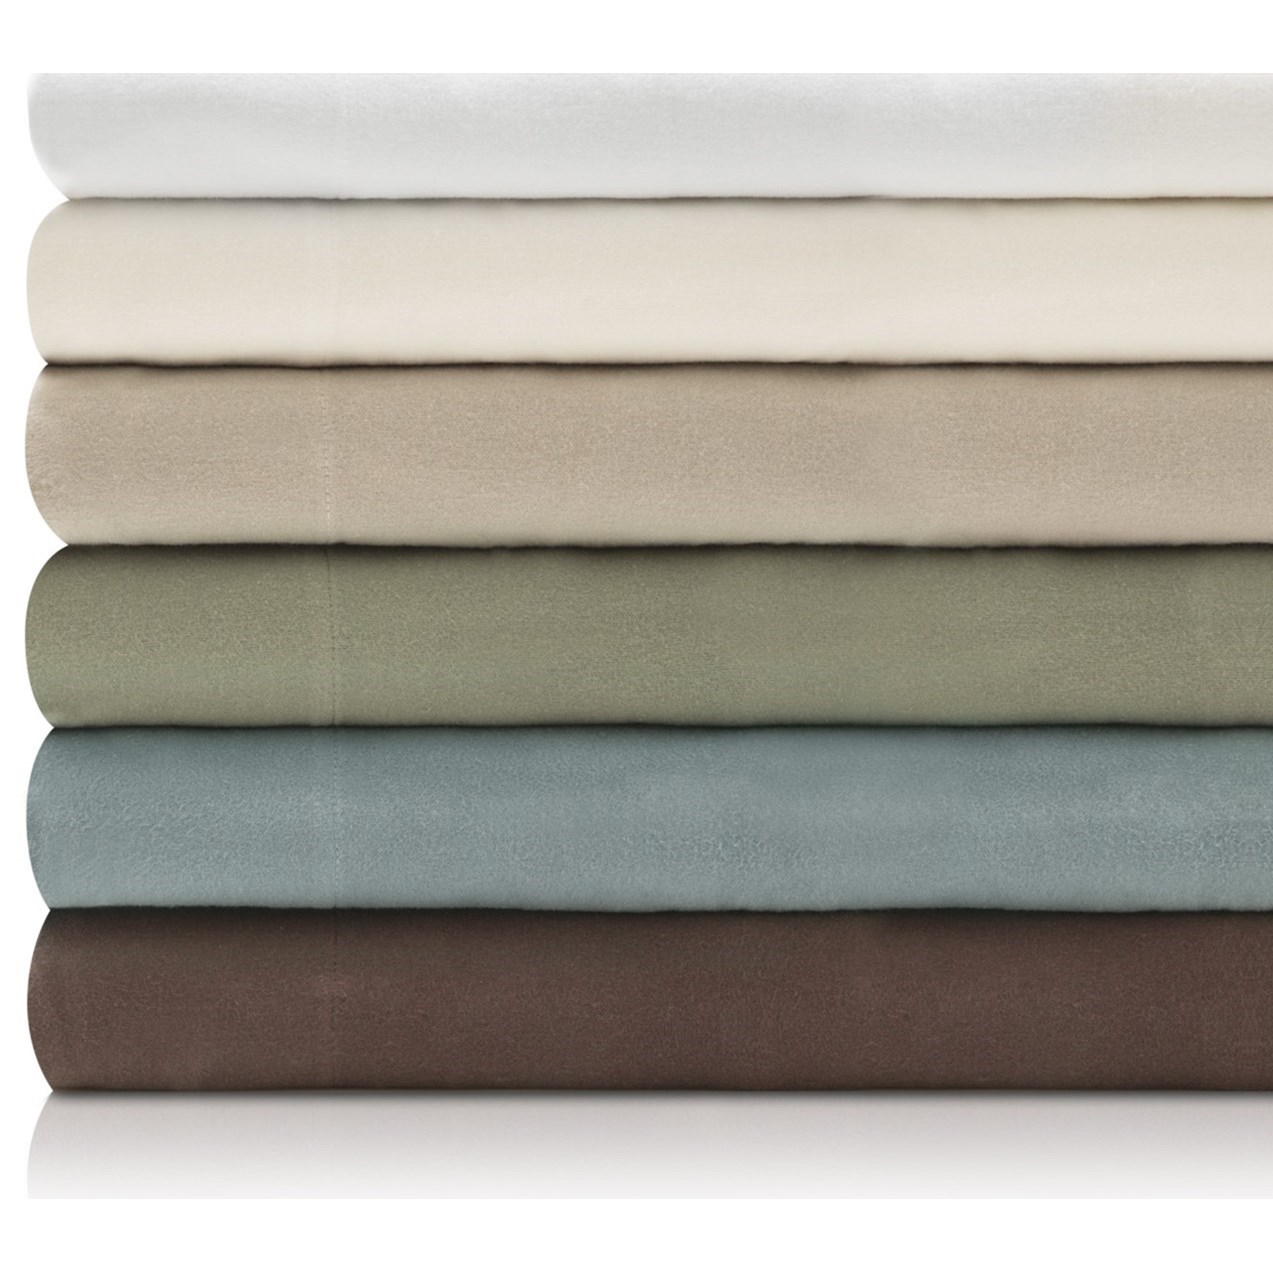 Malouf Portuguese Flannel King Woven™ Portuguese Flannel Sheet Set - Item Number: WO19KKCOFS